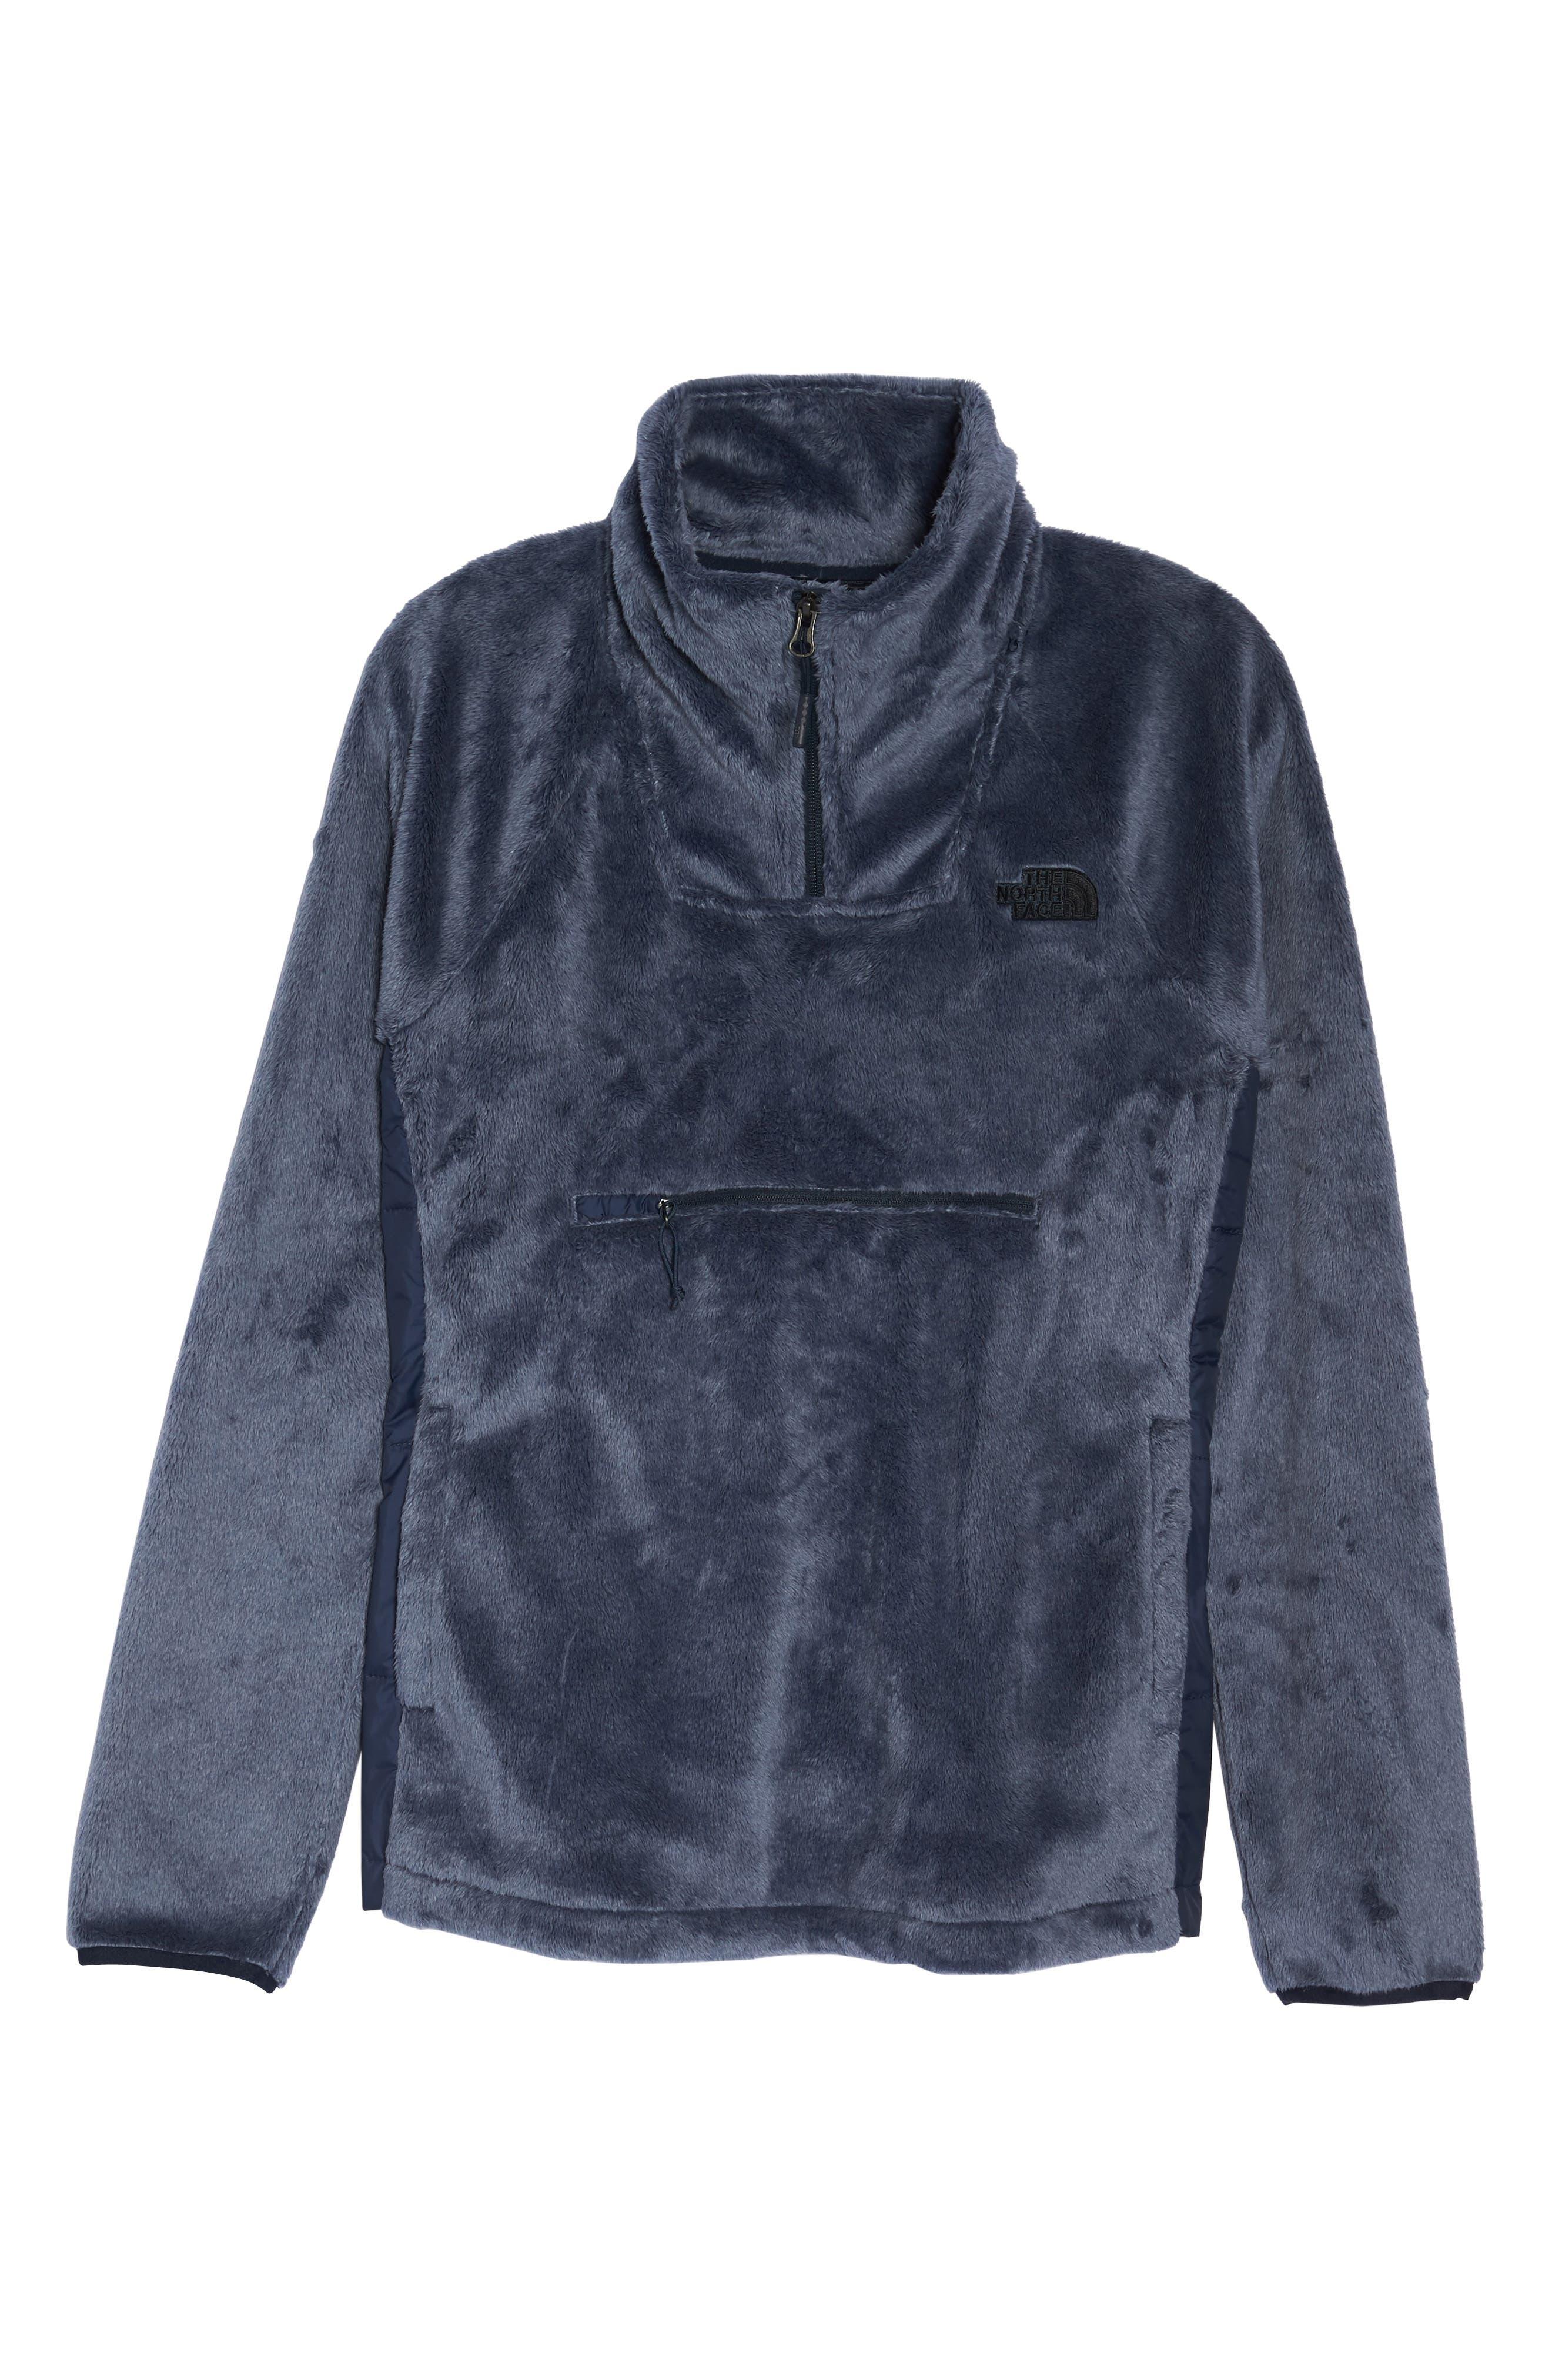 Osito Sport Hybrid Pullover Jacket,                             Alternate thumbnail 6, color,                             401